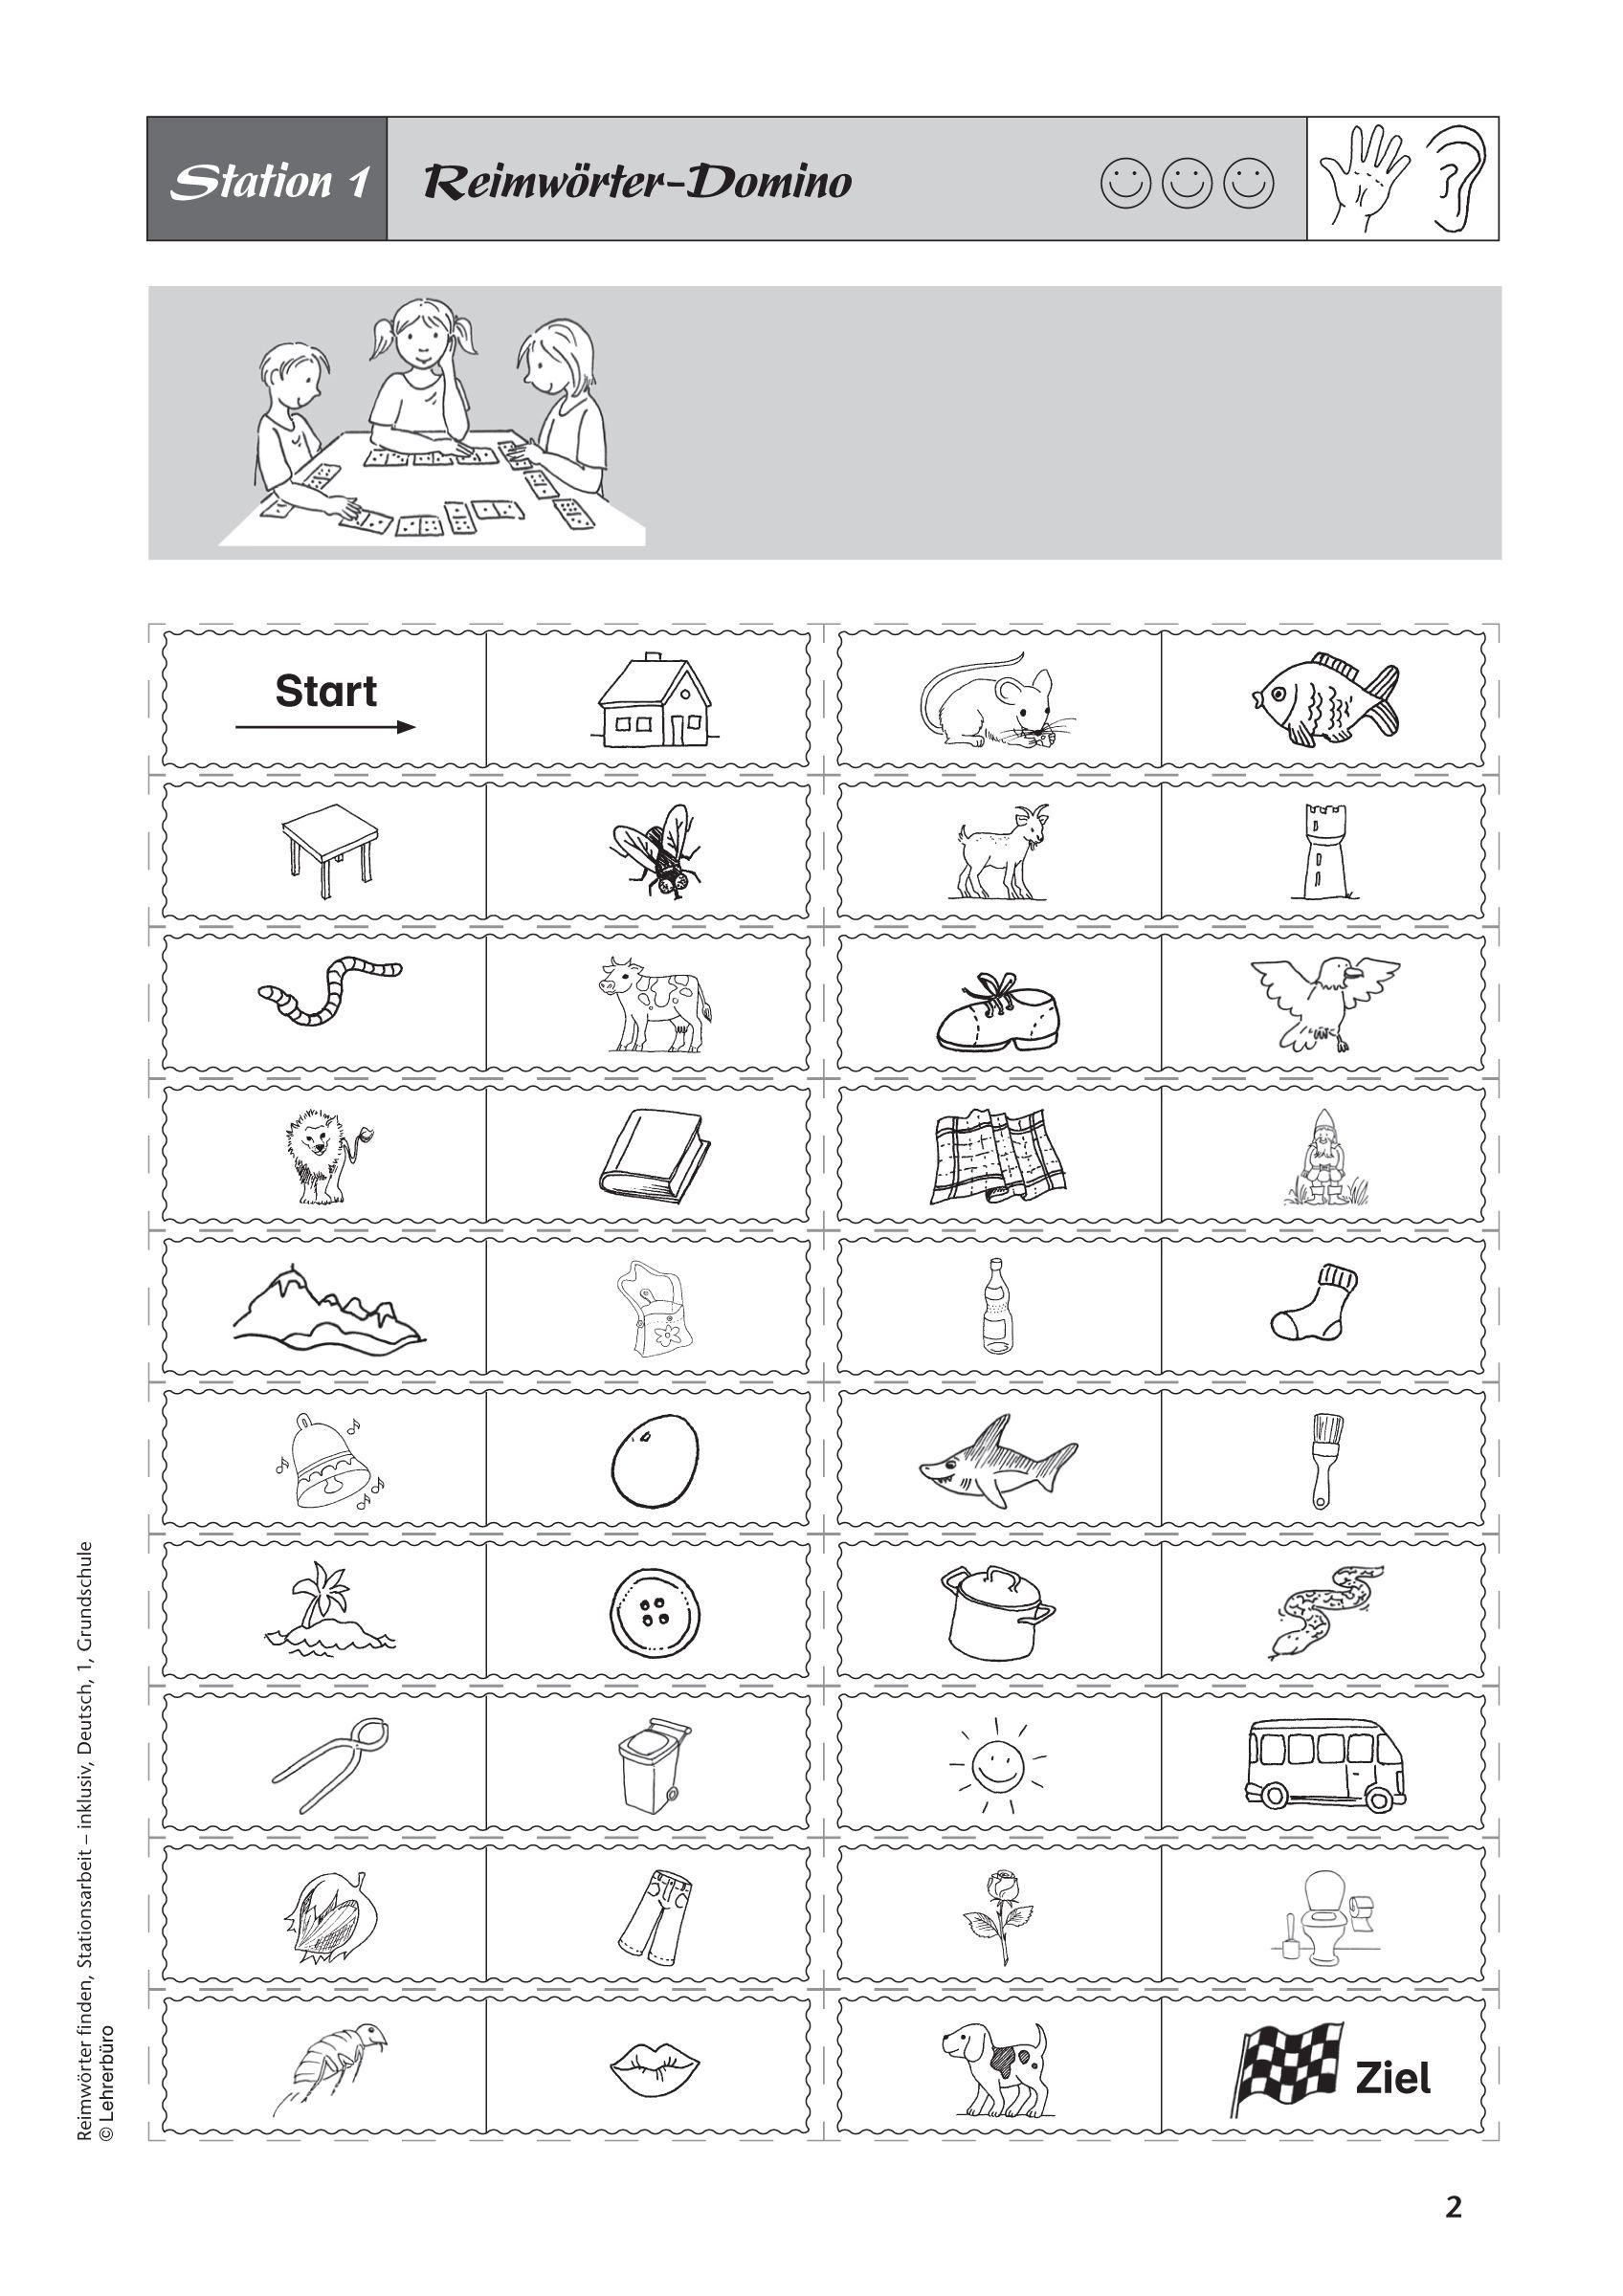 Grundschule Deutsch Arbeitsblätter Arbeitsblatt Vorschule innen Arbeitsblätter Grundschule Deutsch 1 Klasse